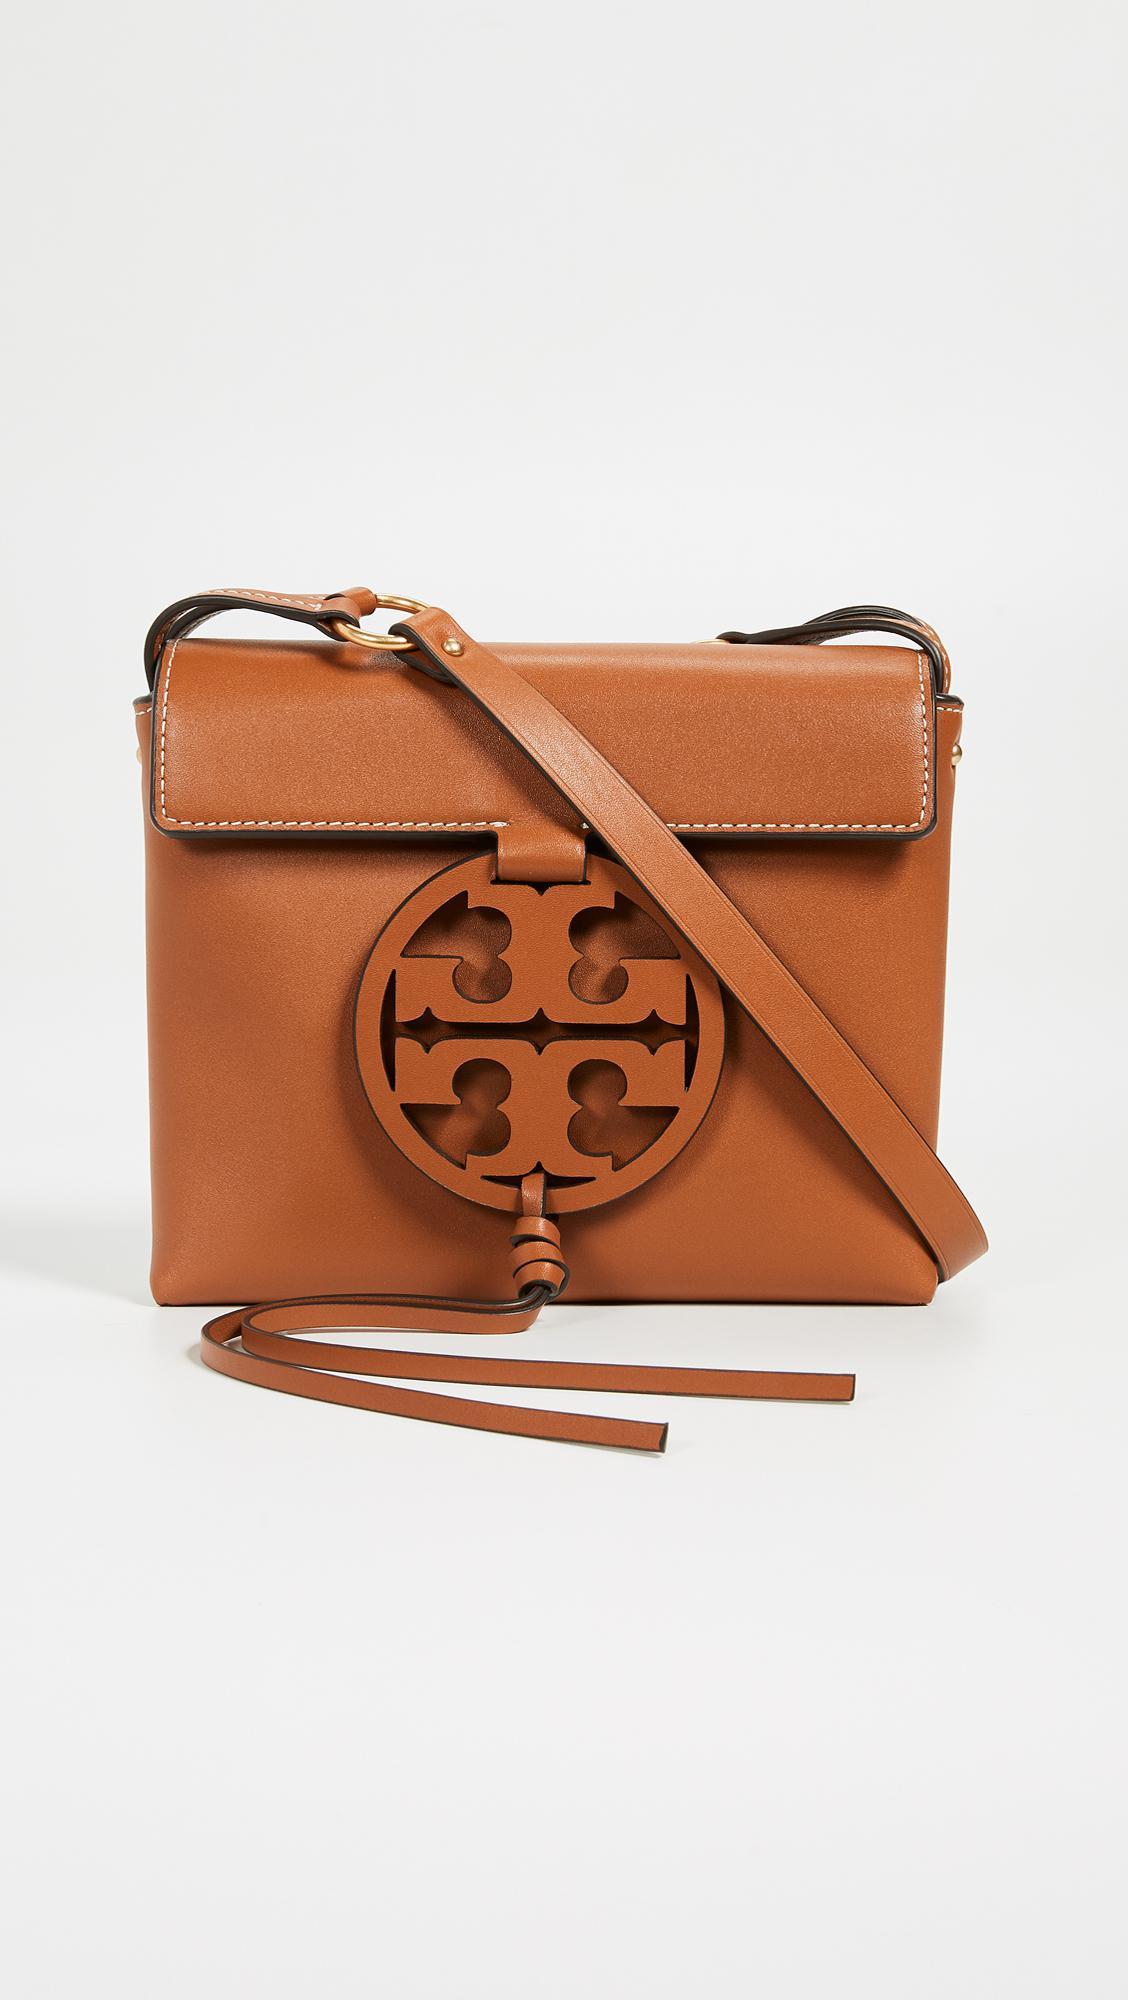 bd2ada3502f344 Tory Burch. Women s Miller Crossbody Bag